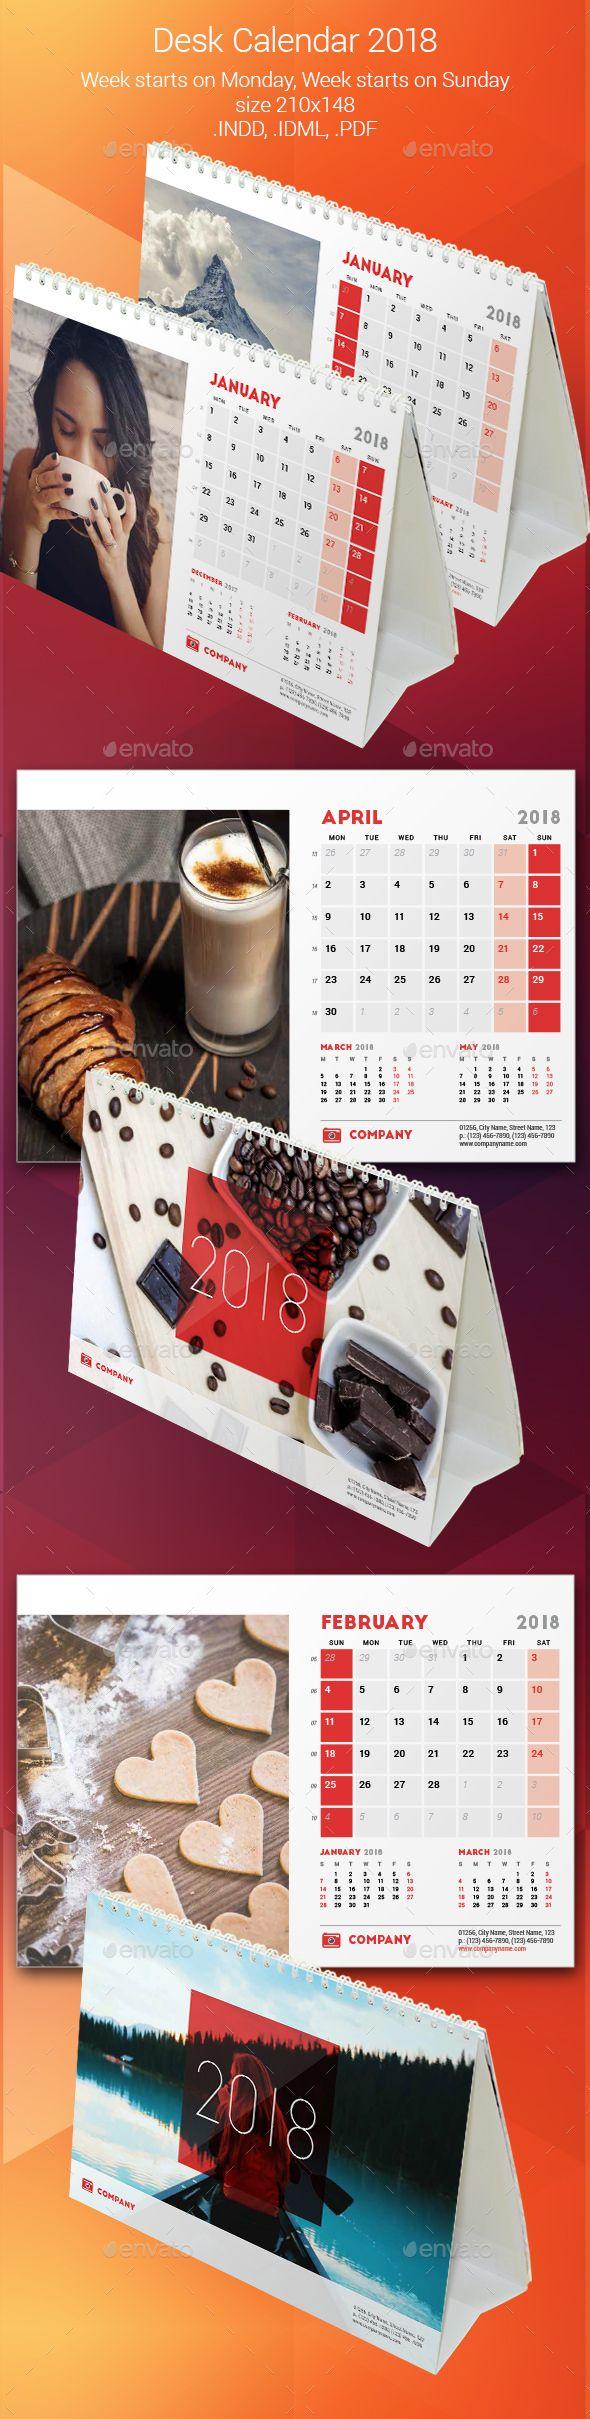 #corporate #Desk #Calendar #template #2018 - #business #Calendars #Stationery #design. download here: https://graphicriver.net/item/desk-calendar-2018/20214077?ref=yinkira